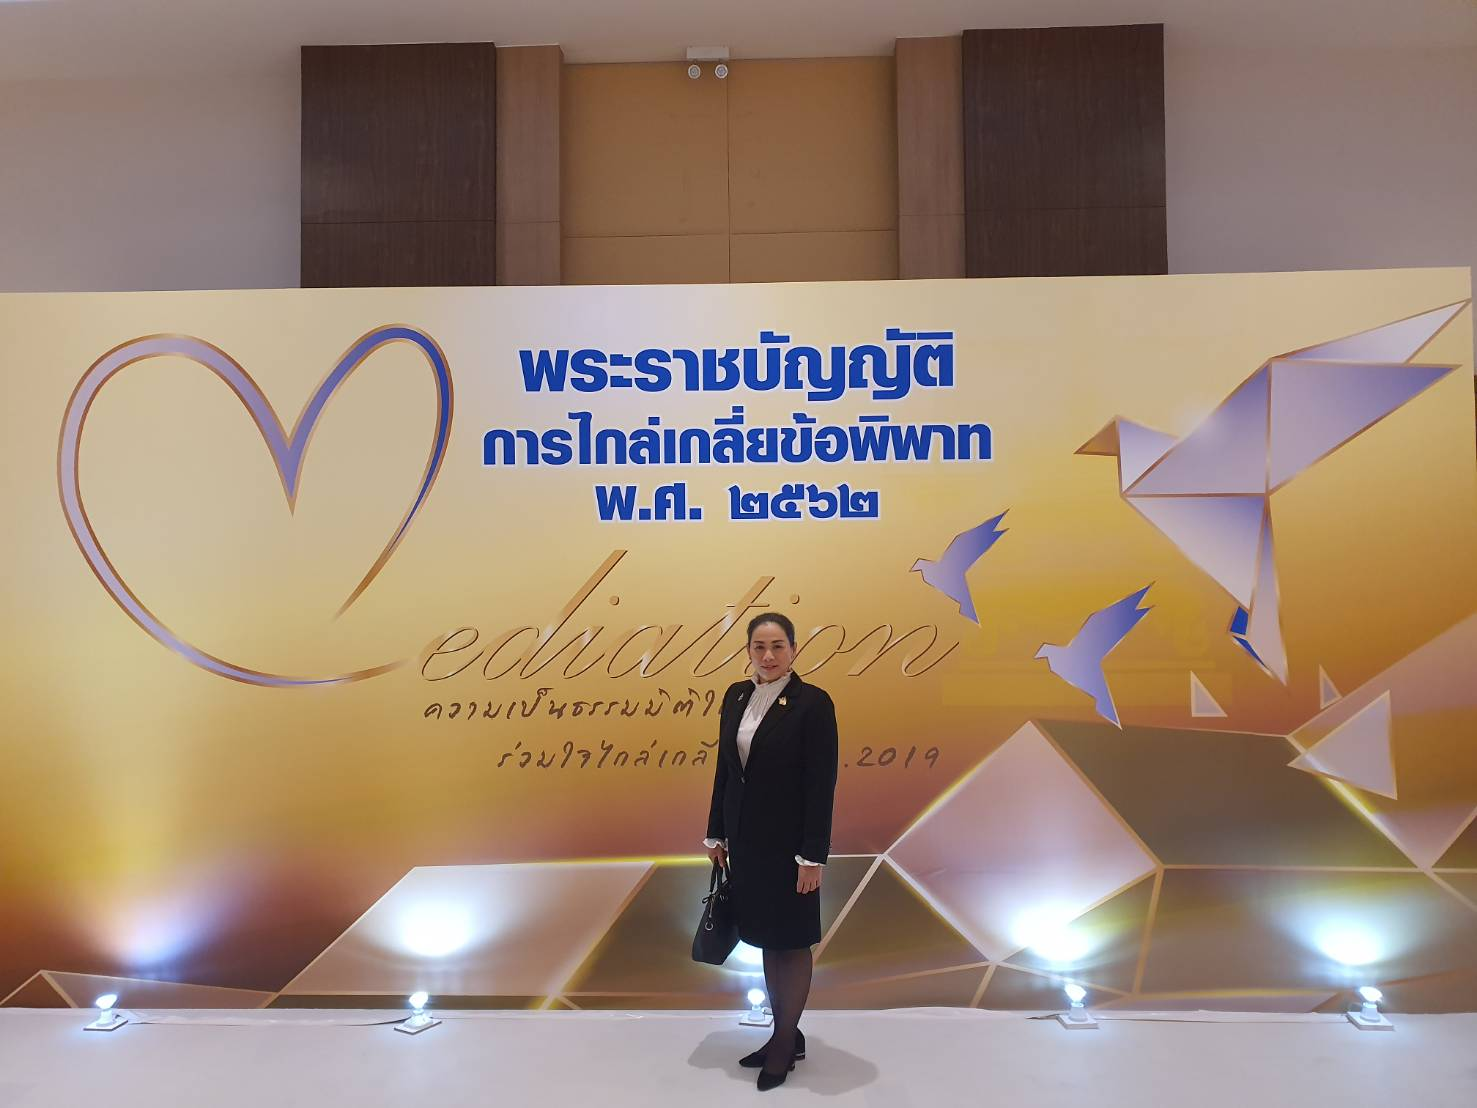 Ajan Natsamol Tanarungsarid, an assistant of the president for special affairs